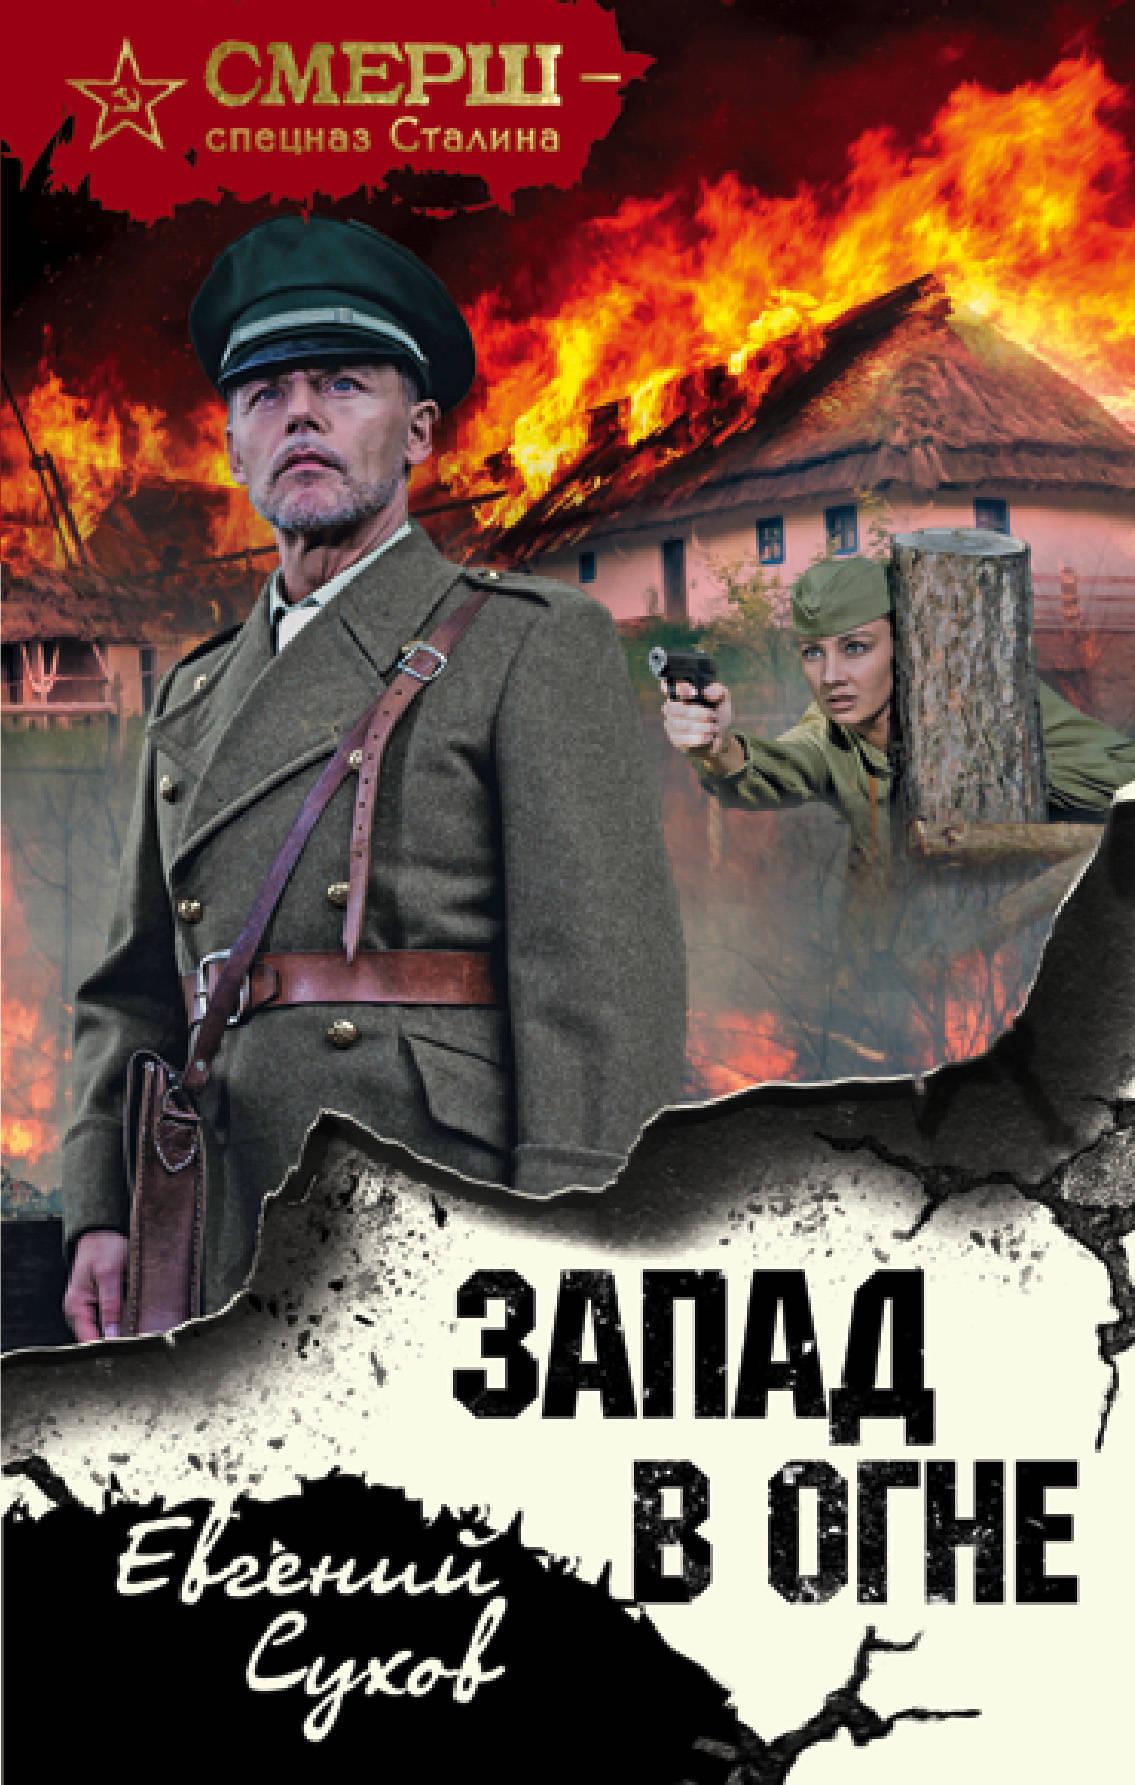 Сухов Евгений Запад в огне